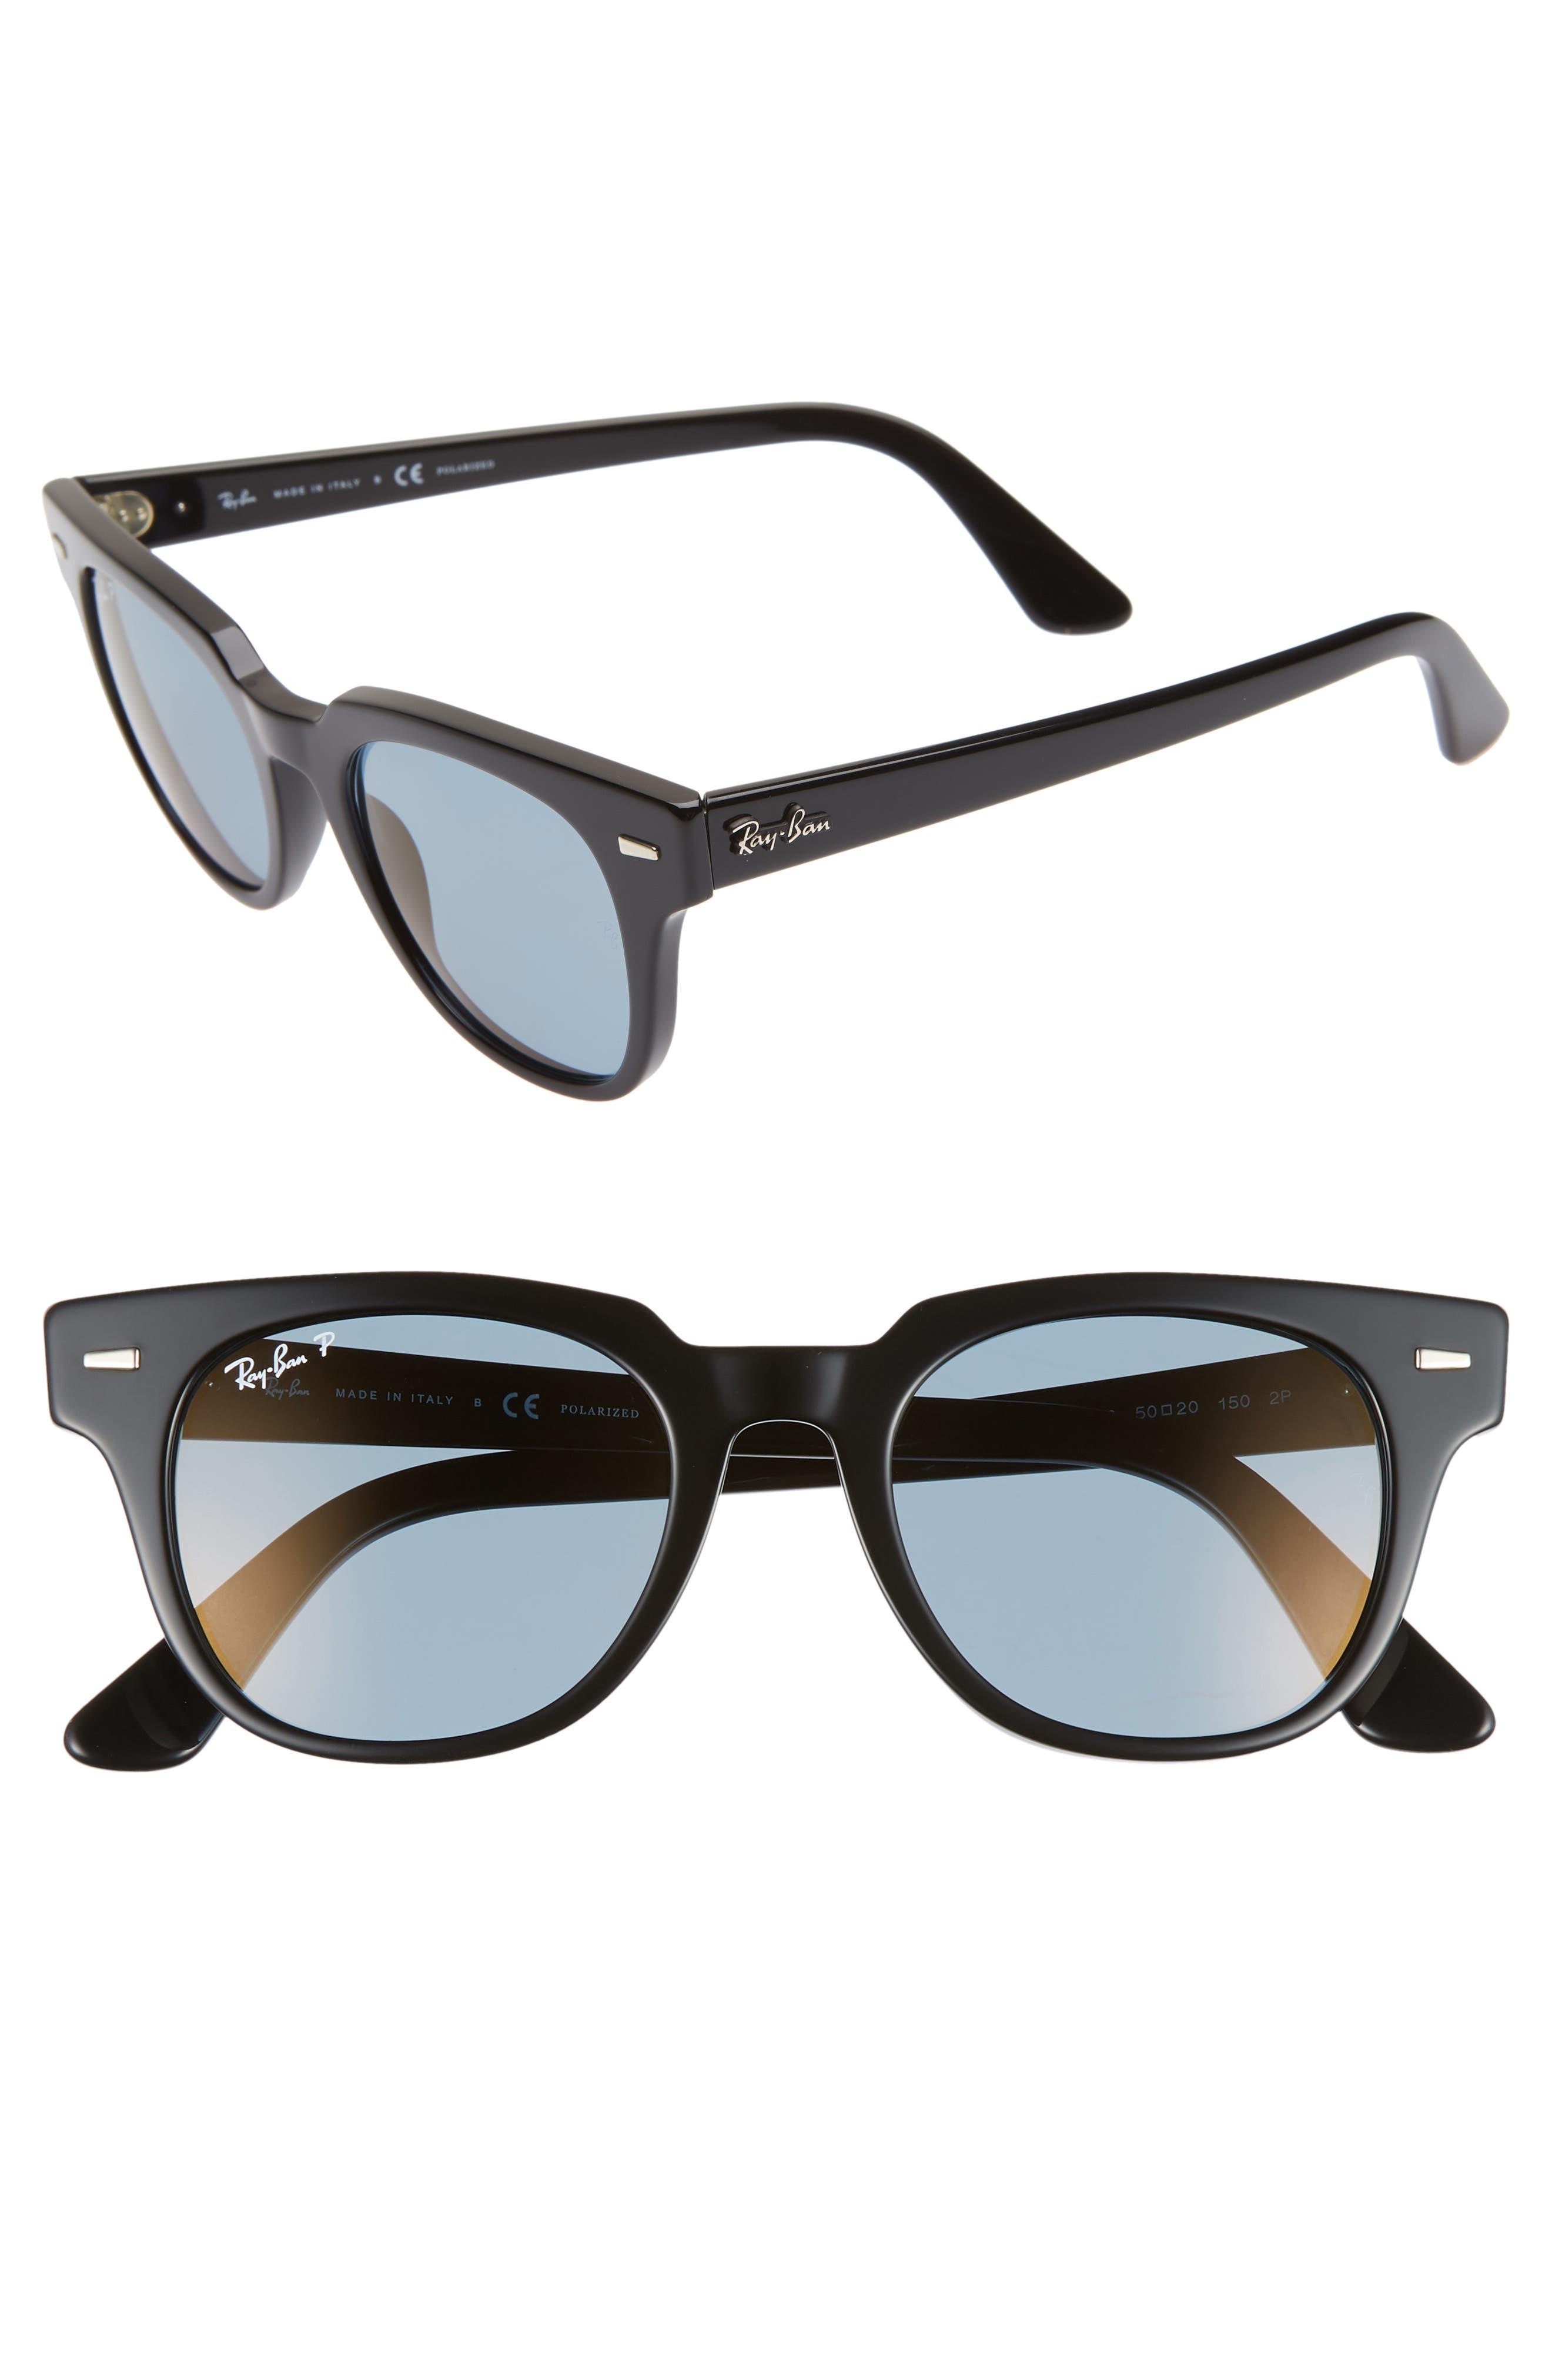 Ray-Ban Meteor 50Mm Polarized Wayfarer Sunglasses - Black/ Blue Mirror